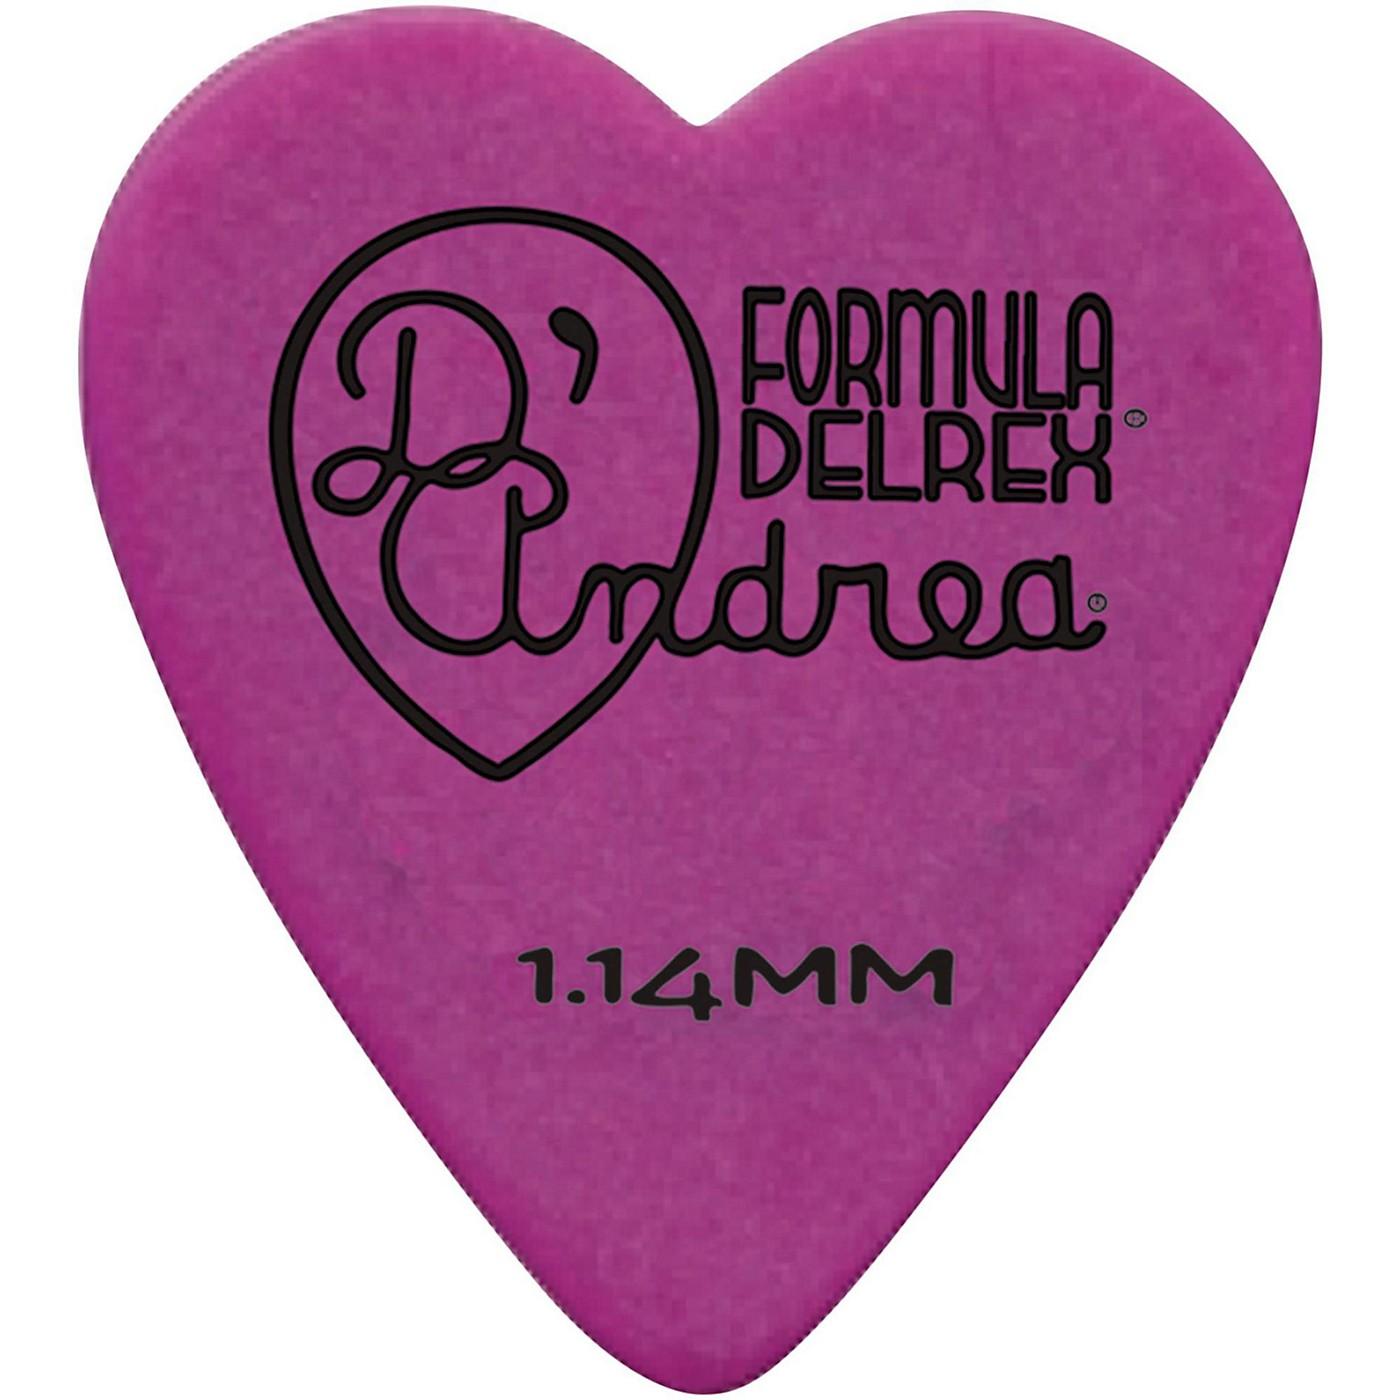 D'Andrea 323 Heart Delrex Delrin Picks - One Dozen thumbnail